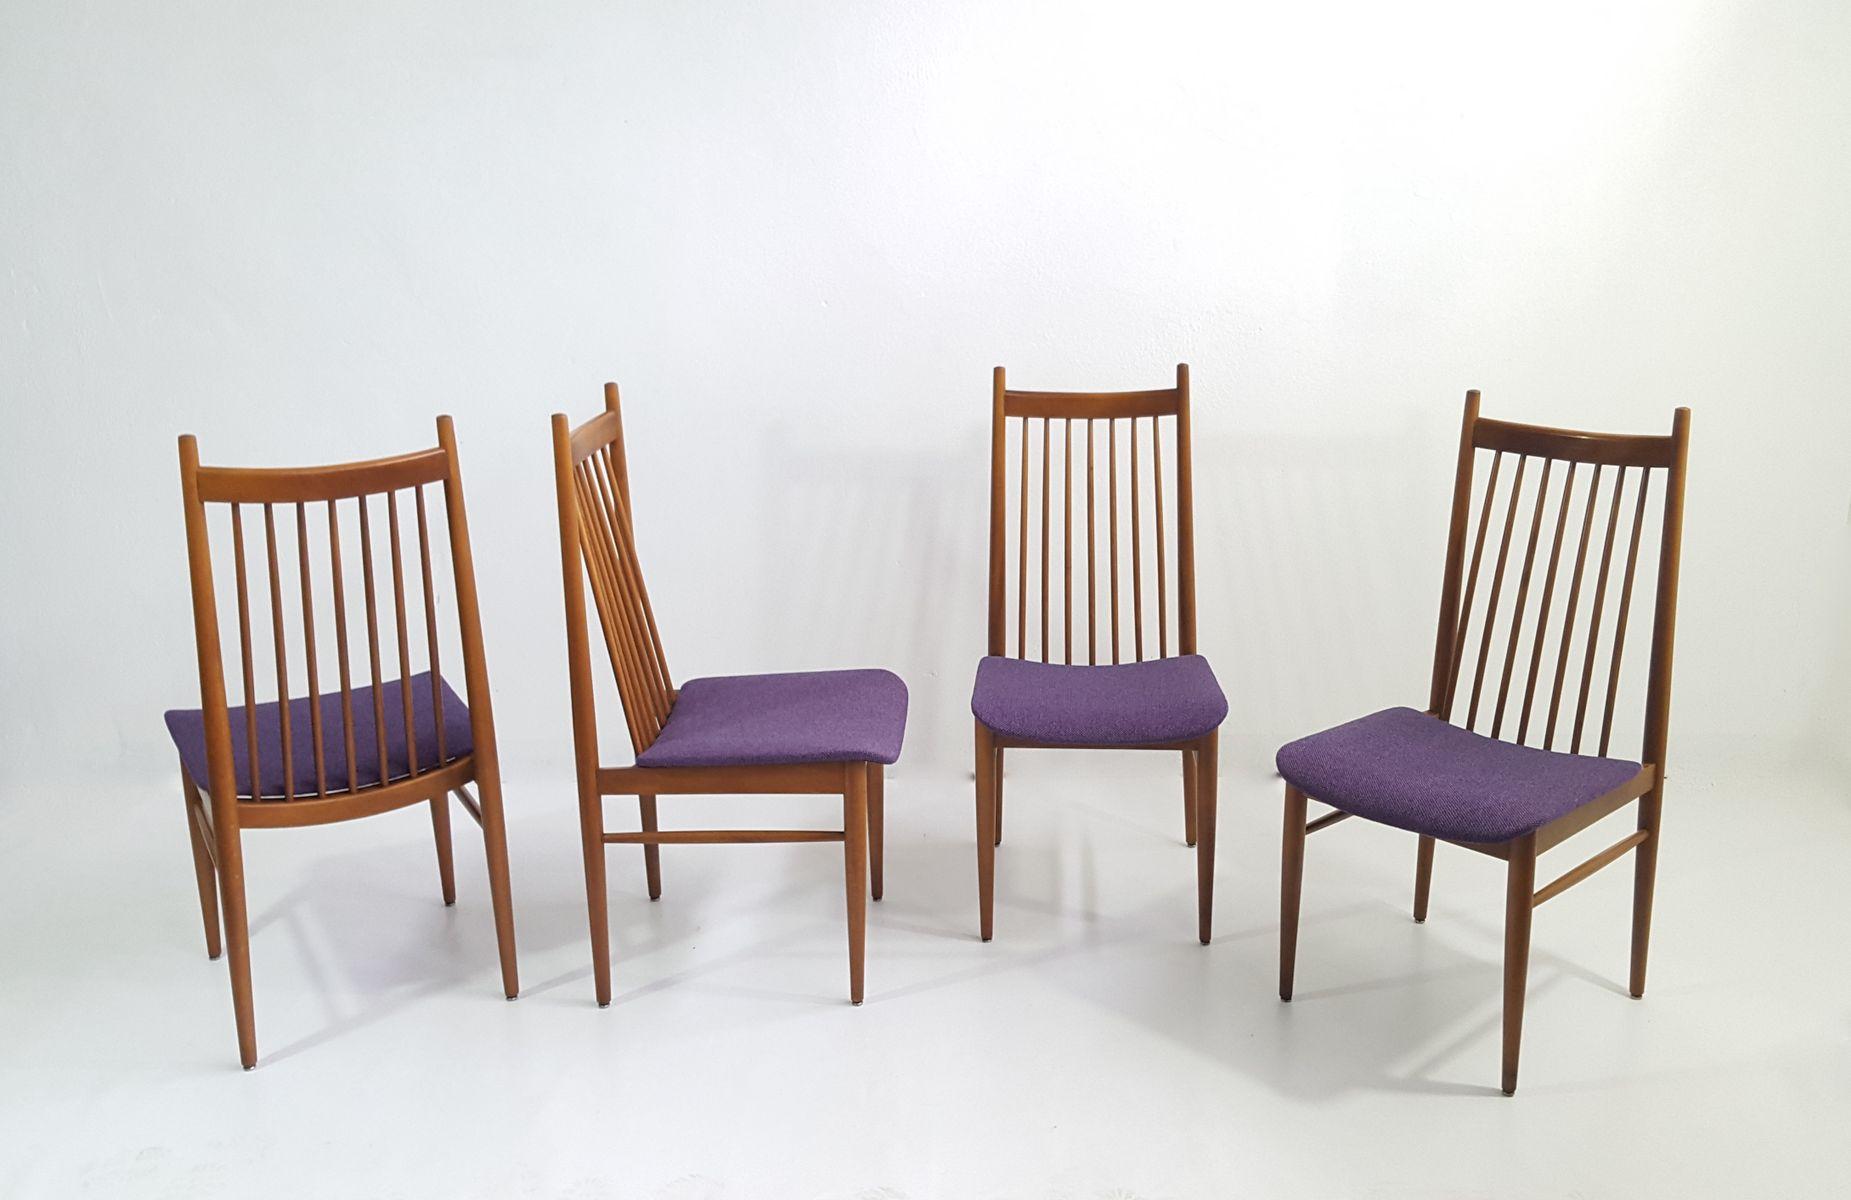 skandinavische teak st hle 1960er 4er set bei pamono kaufen. Black Bedroom Furniture Sets. Home Design Ideas